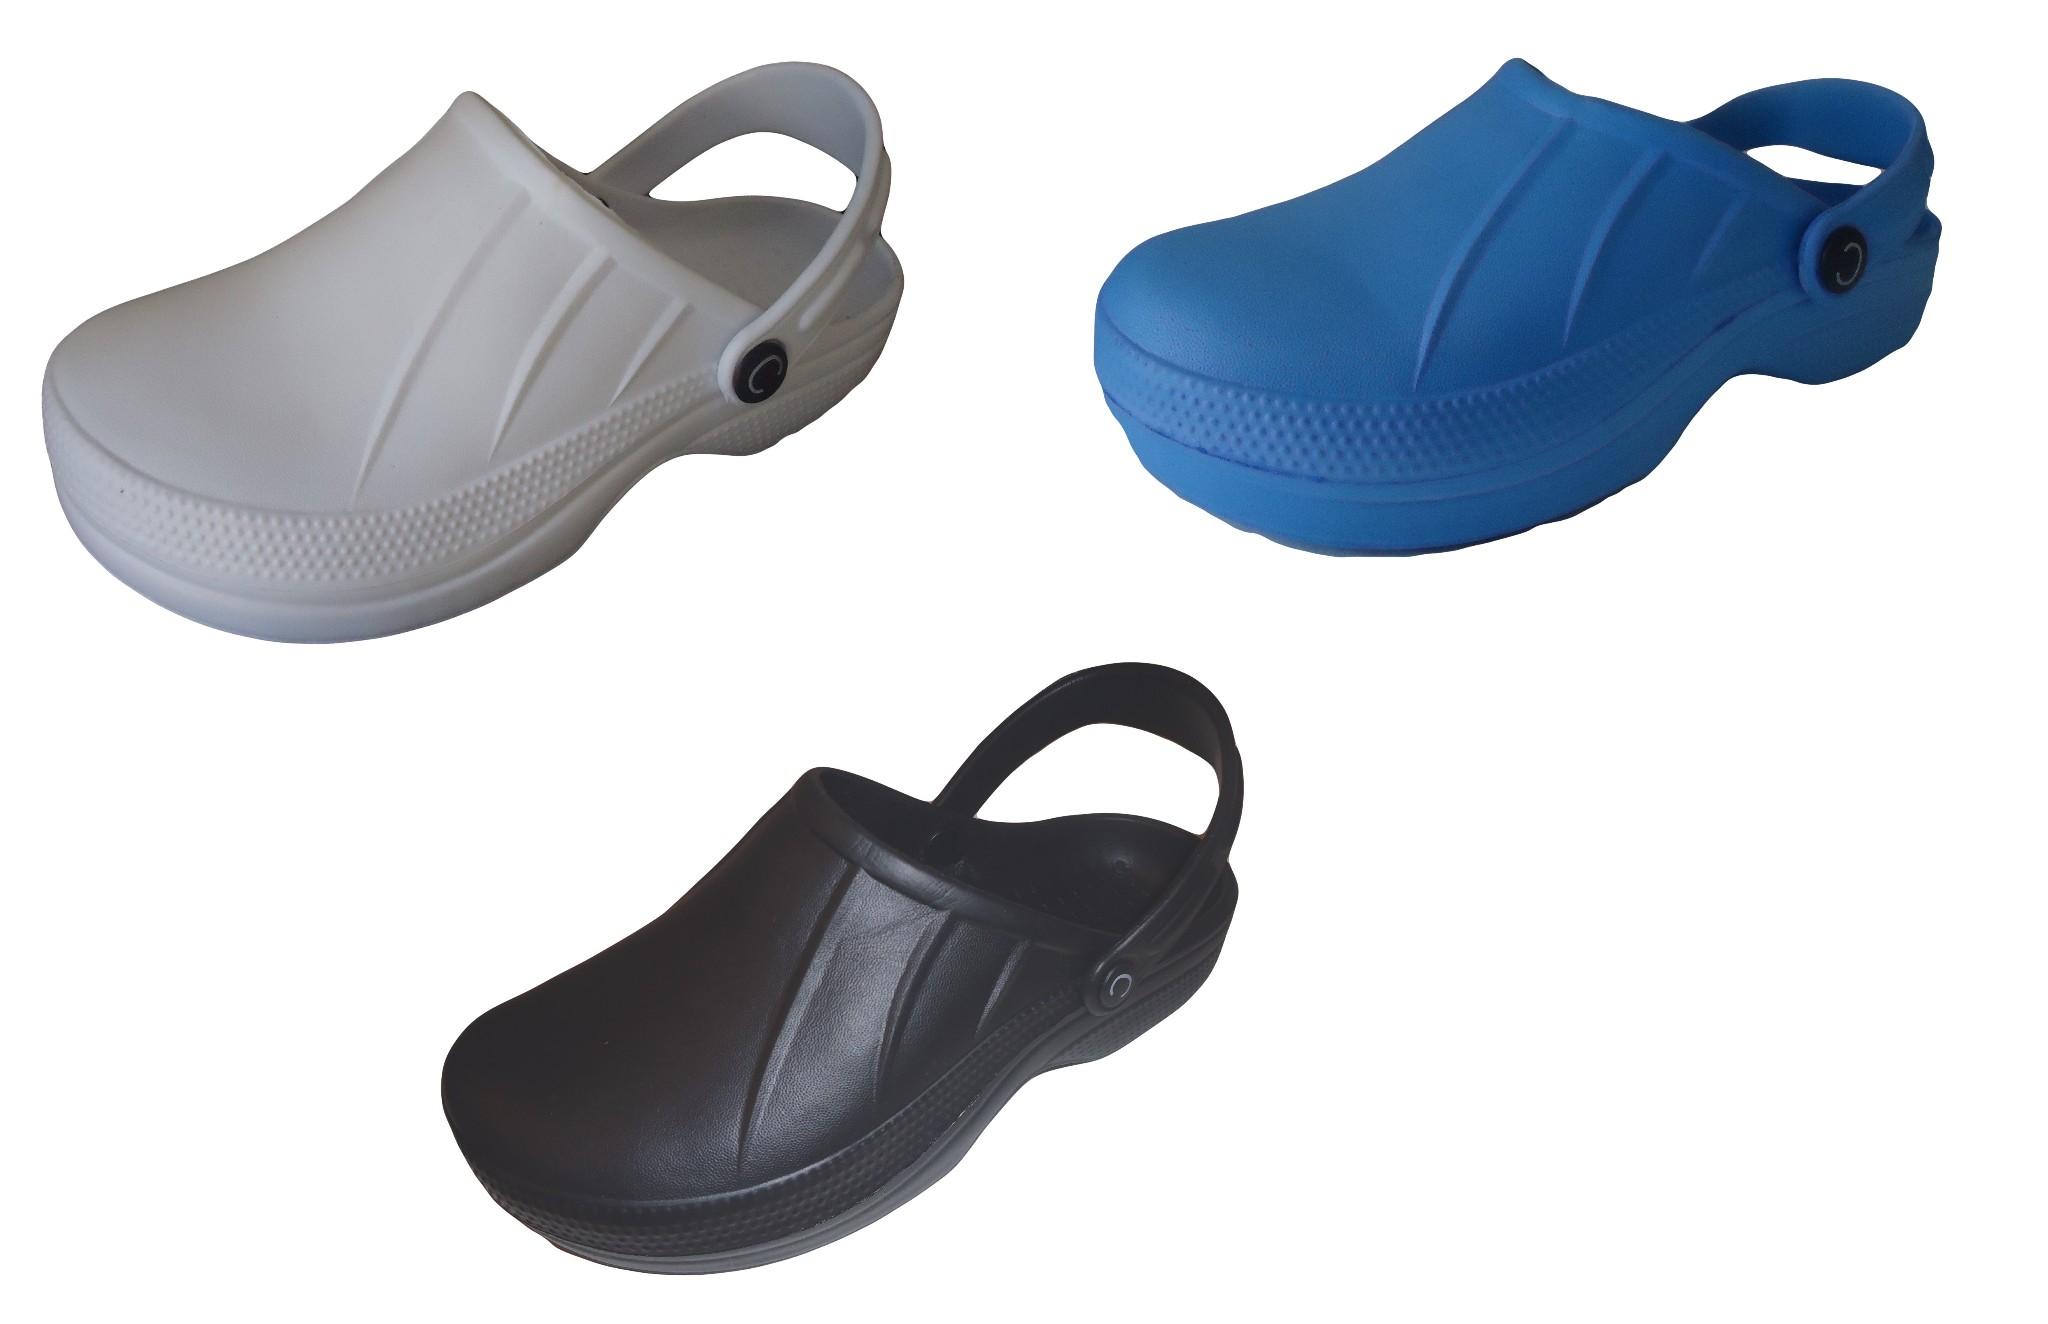 Garden Clogs Mules Gardening Shoes Cloggis Full Safety Clog